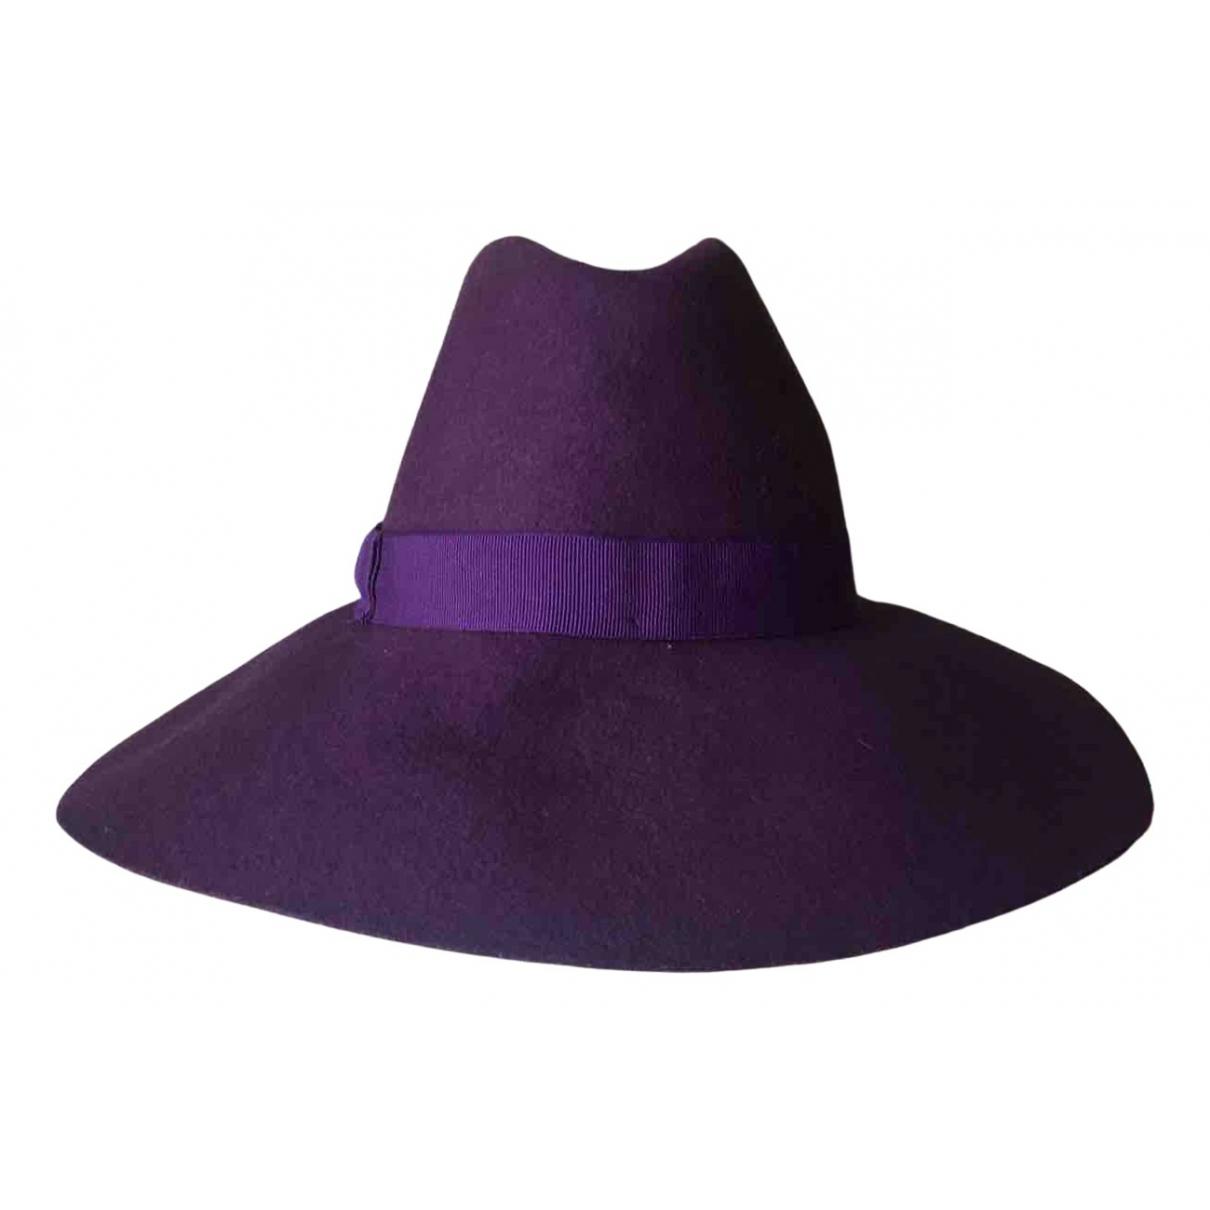 Sombrero de Lana Stefanel